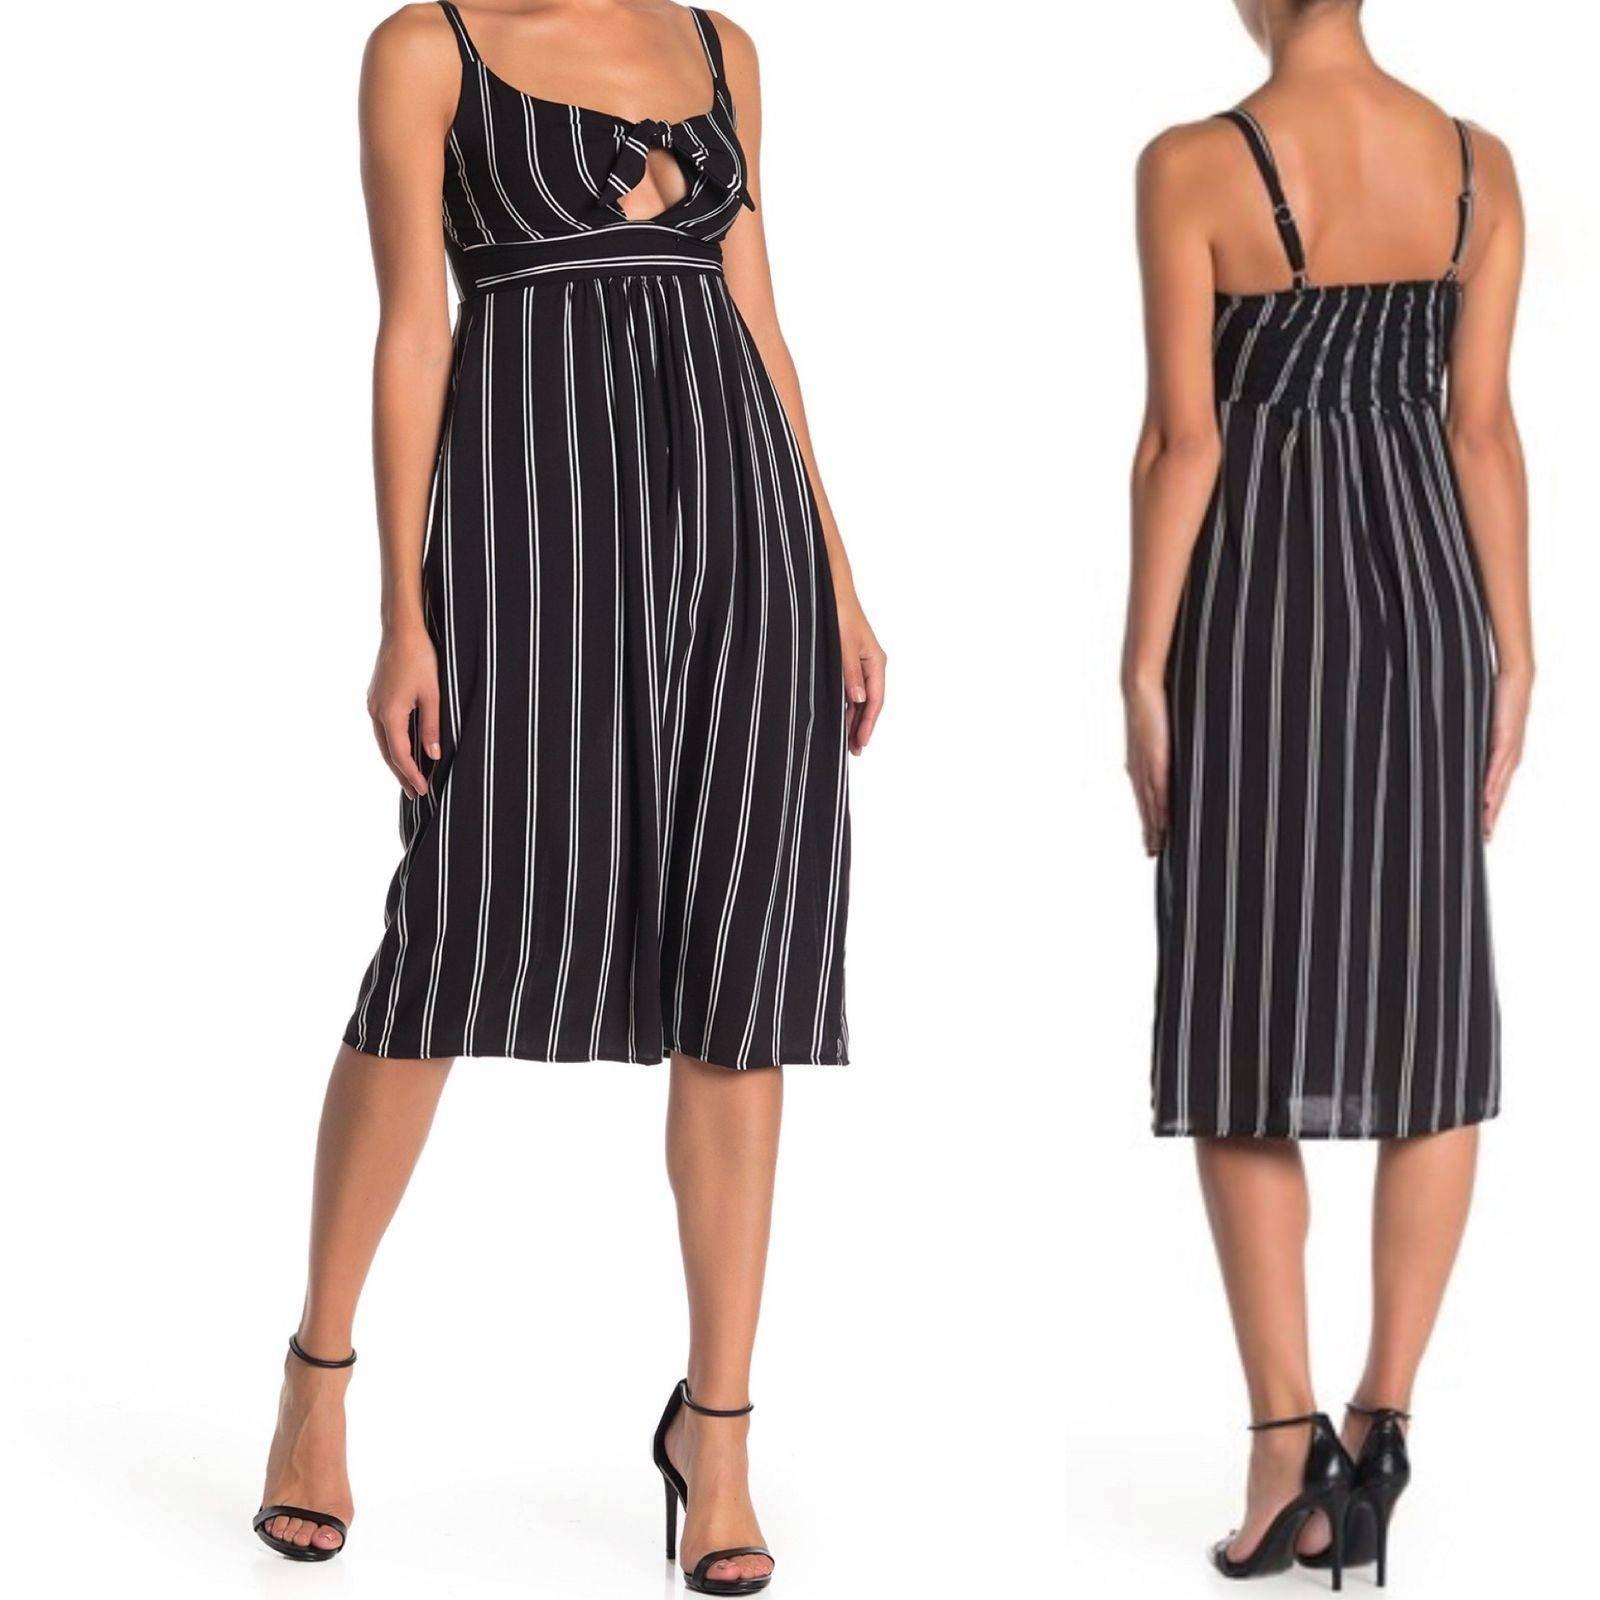 Velvet Torch Striped Tie Midi Dress